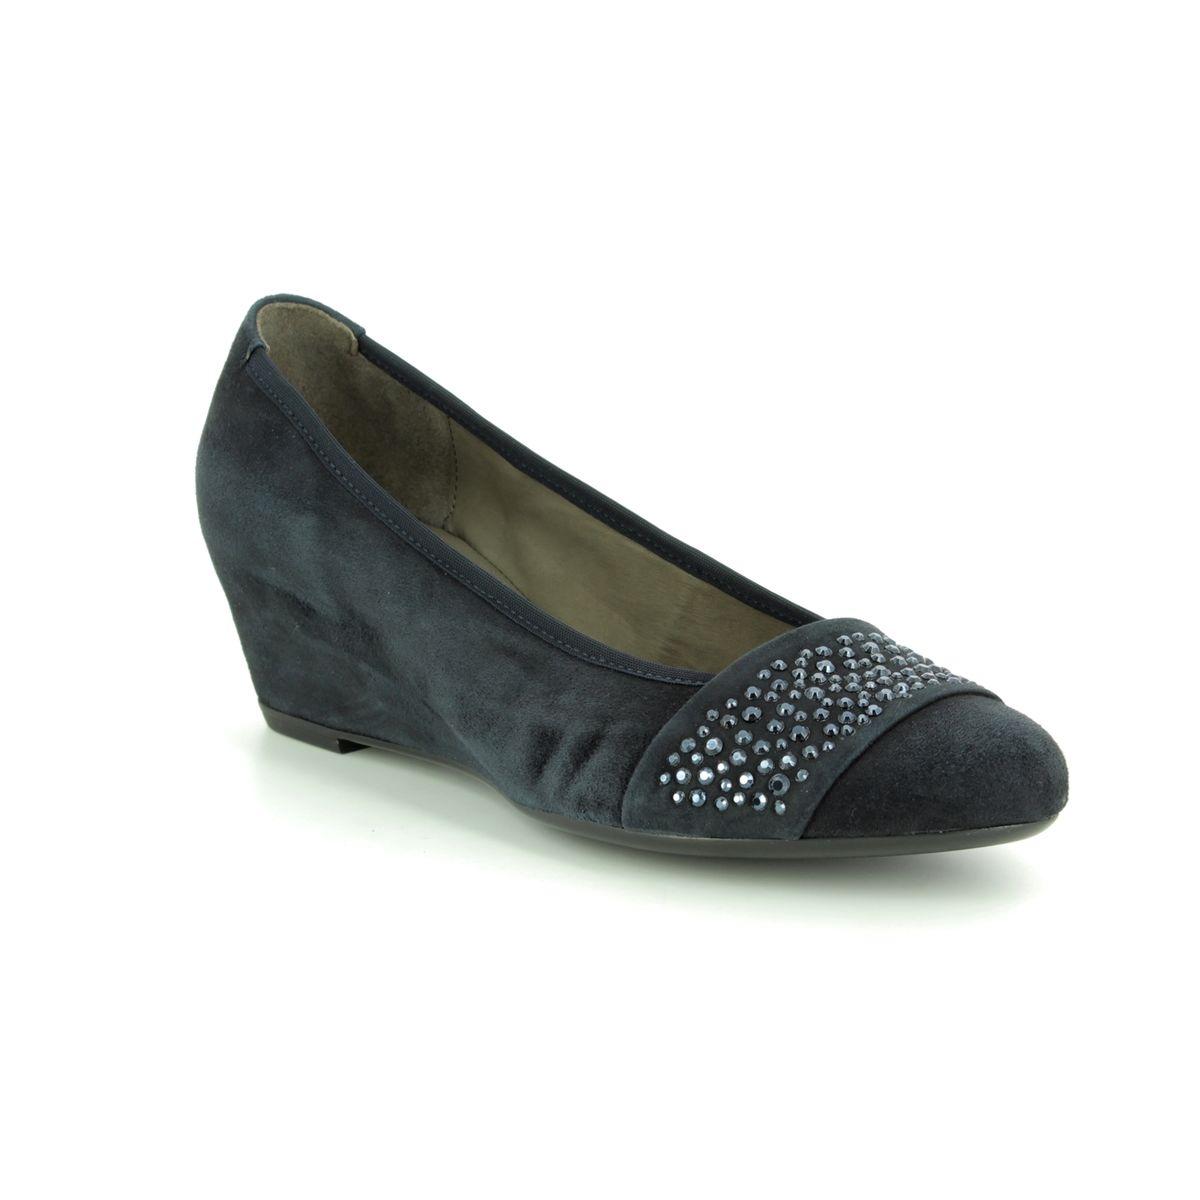 cf4aab569e Gabor Wedge Shoes - Navy nubuck - 25.369.16 FODDER